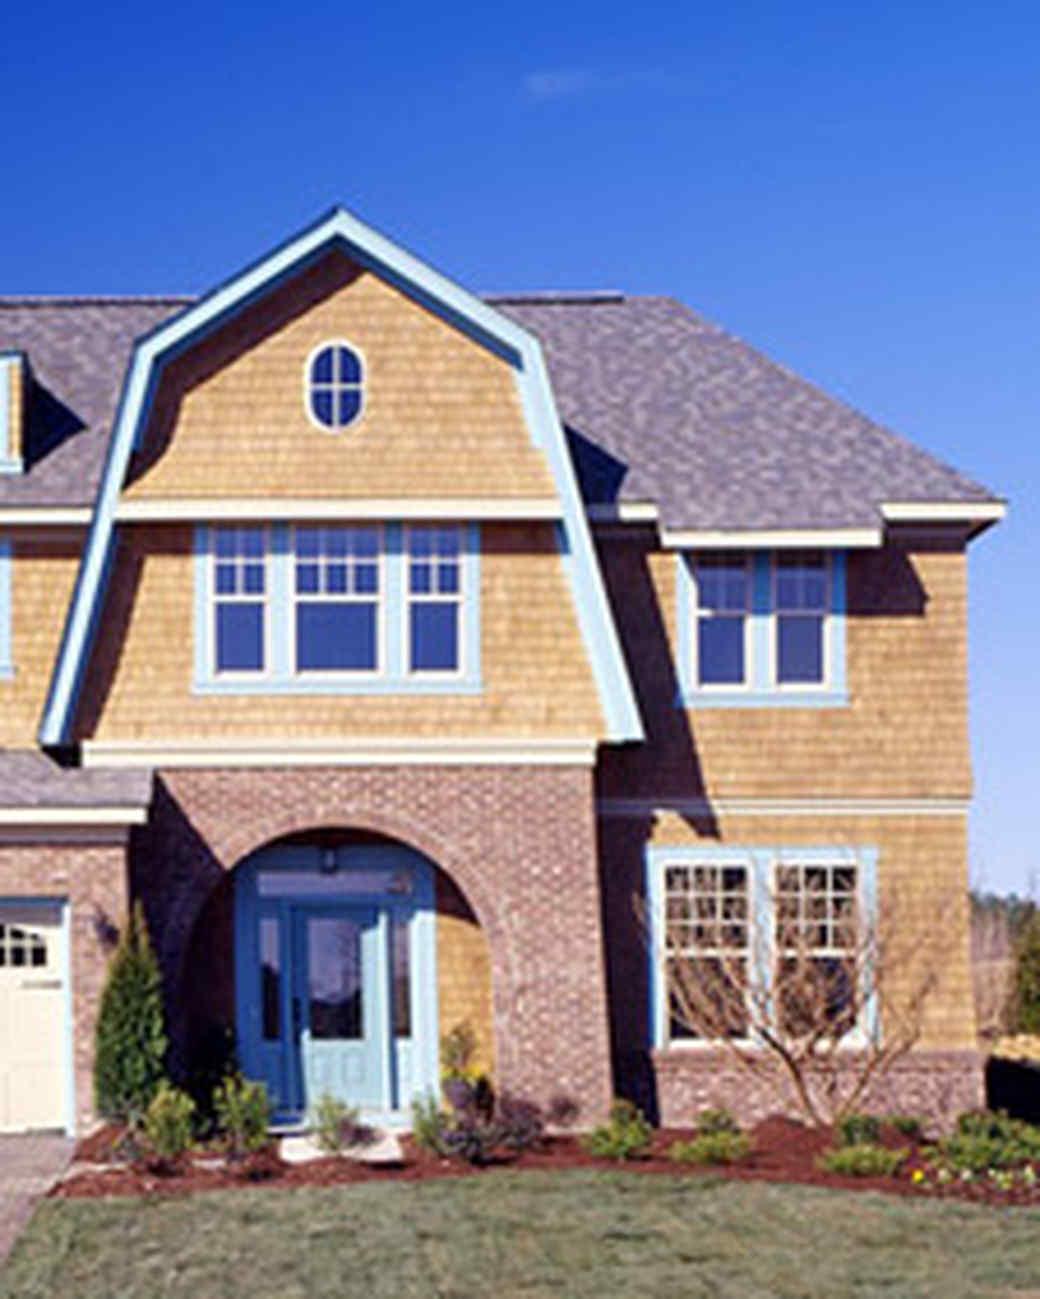 kb_home_2006.jpg